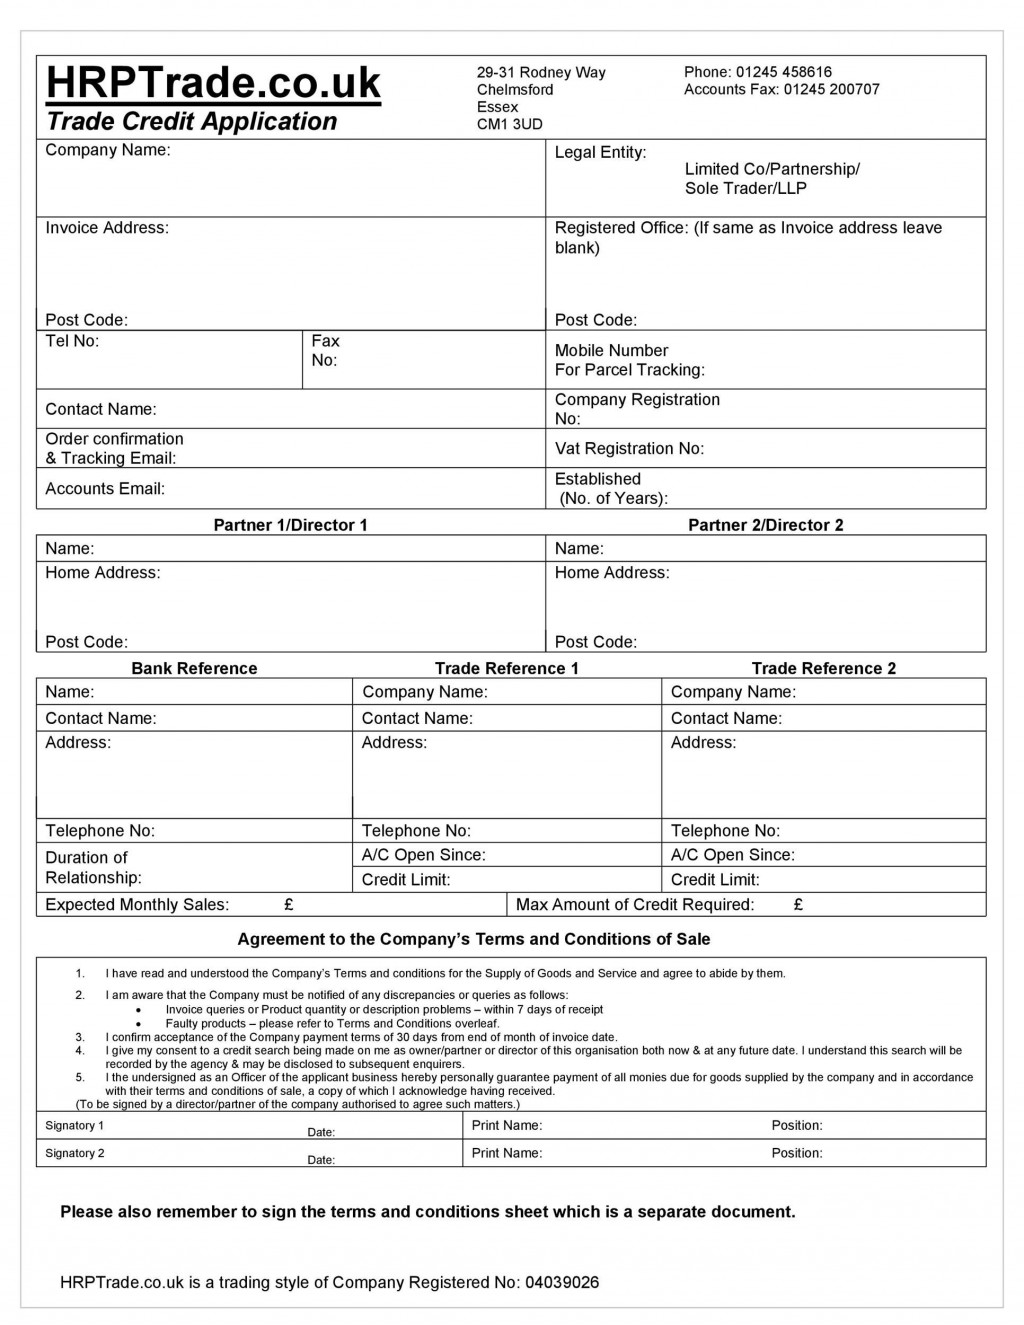 007 Surprising Busines Credit Application Form Uk Inspiration  Template Free AccountLarge